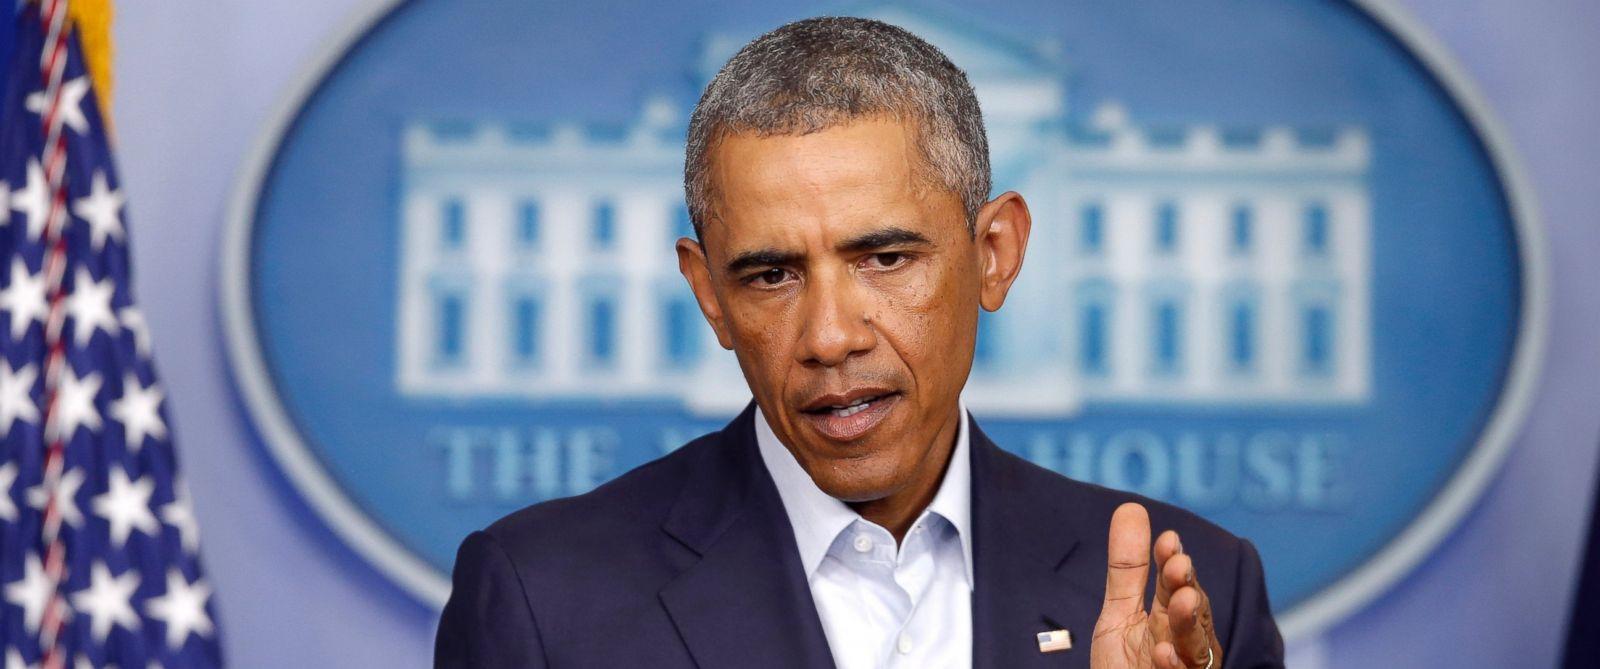 PHOTO: President Barack Obama speaks on Iraq and Ferguson, Missouri in White House in Washington on Aug. 18, 2014.